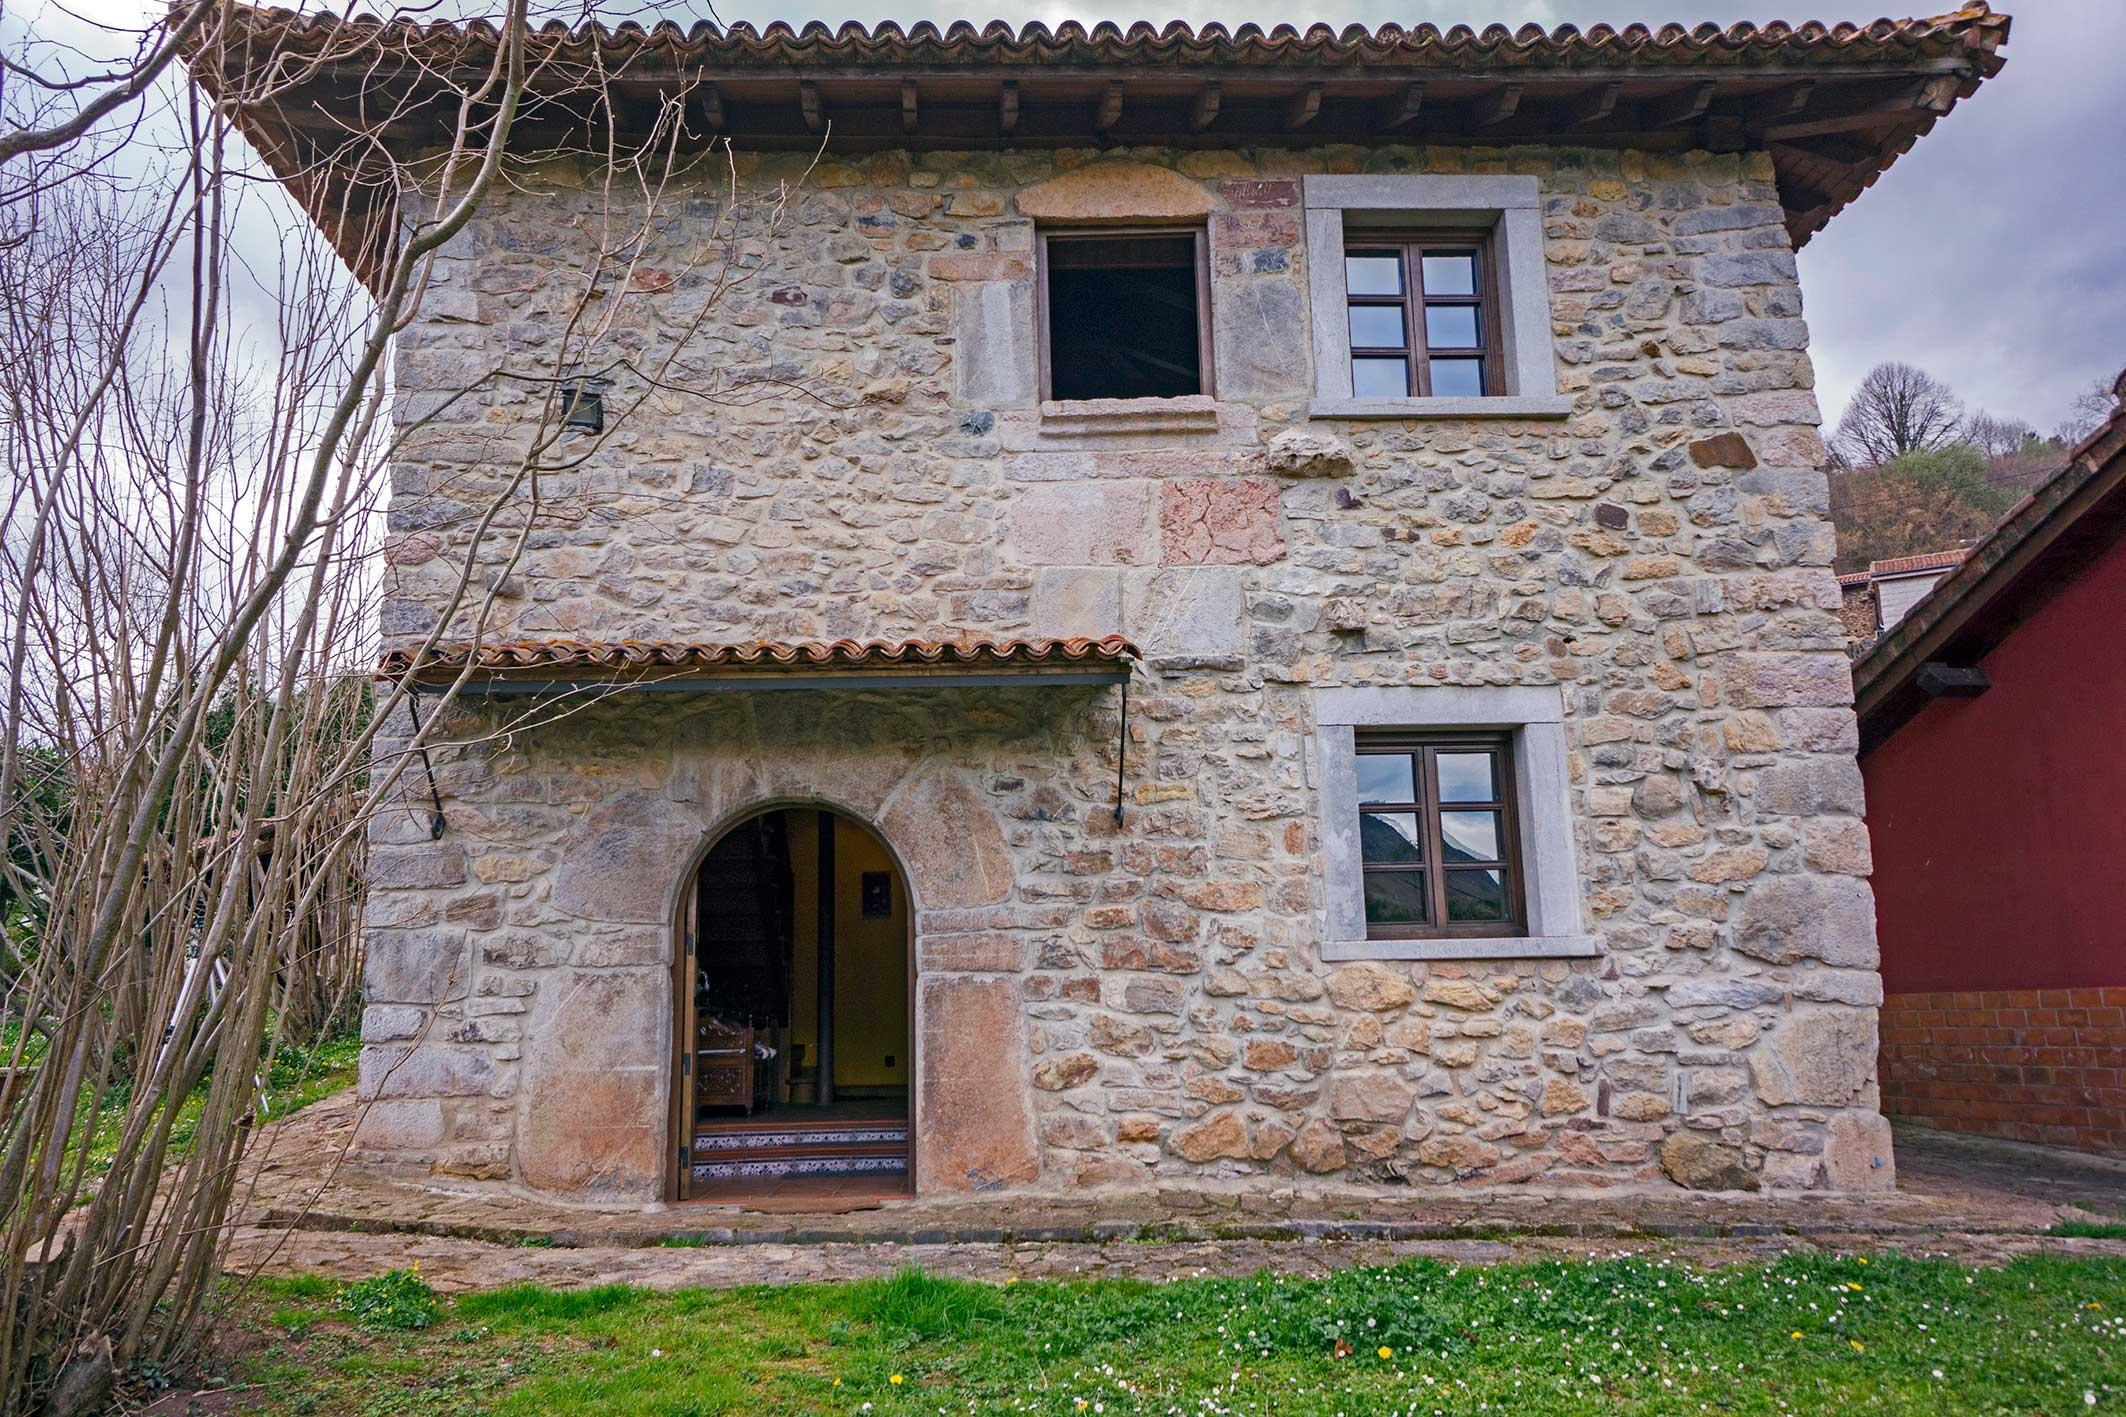 Casa rural catalogada con tres tr squeles m xima categoria que concede principado de asturias - Casas rurales cerca de oviedo ...